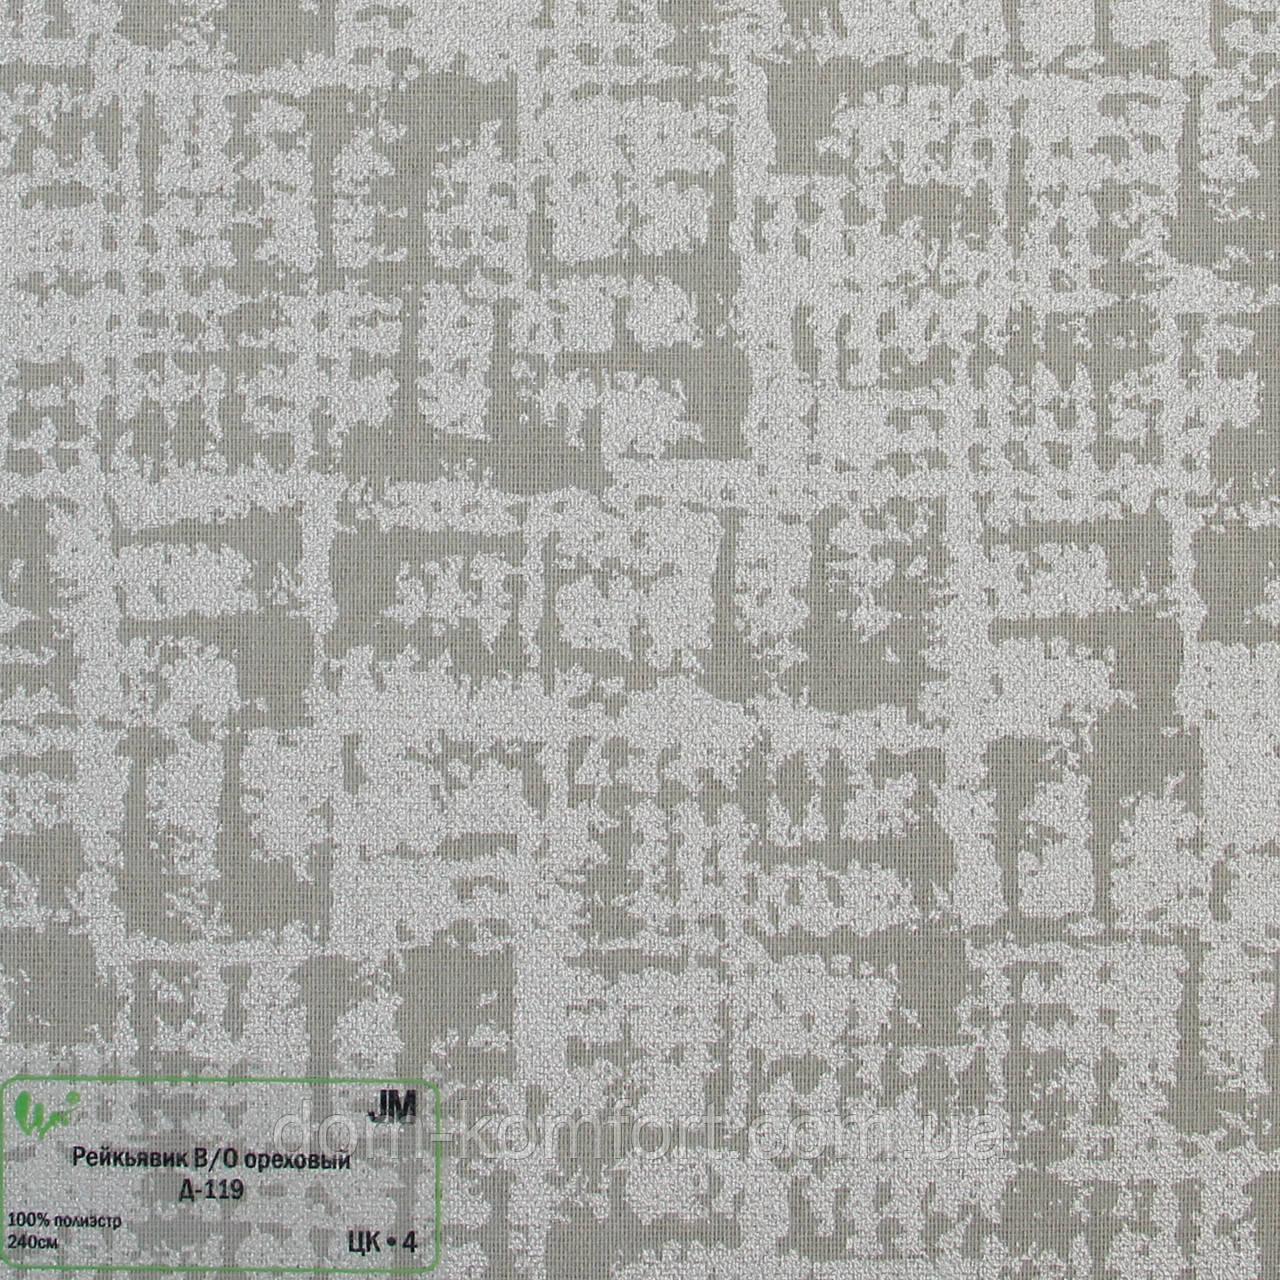 Рулонные шторы Ткань Рейкьявик блэк-аут Ореховый